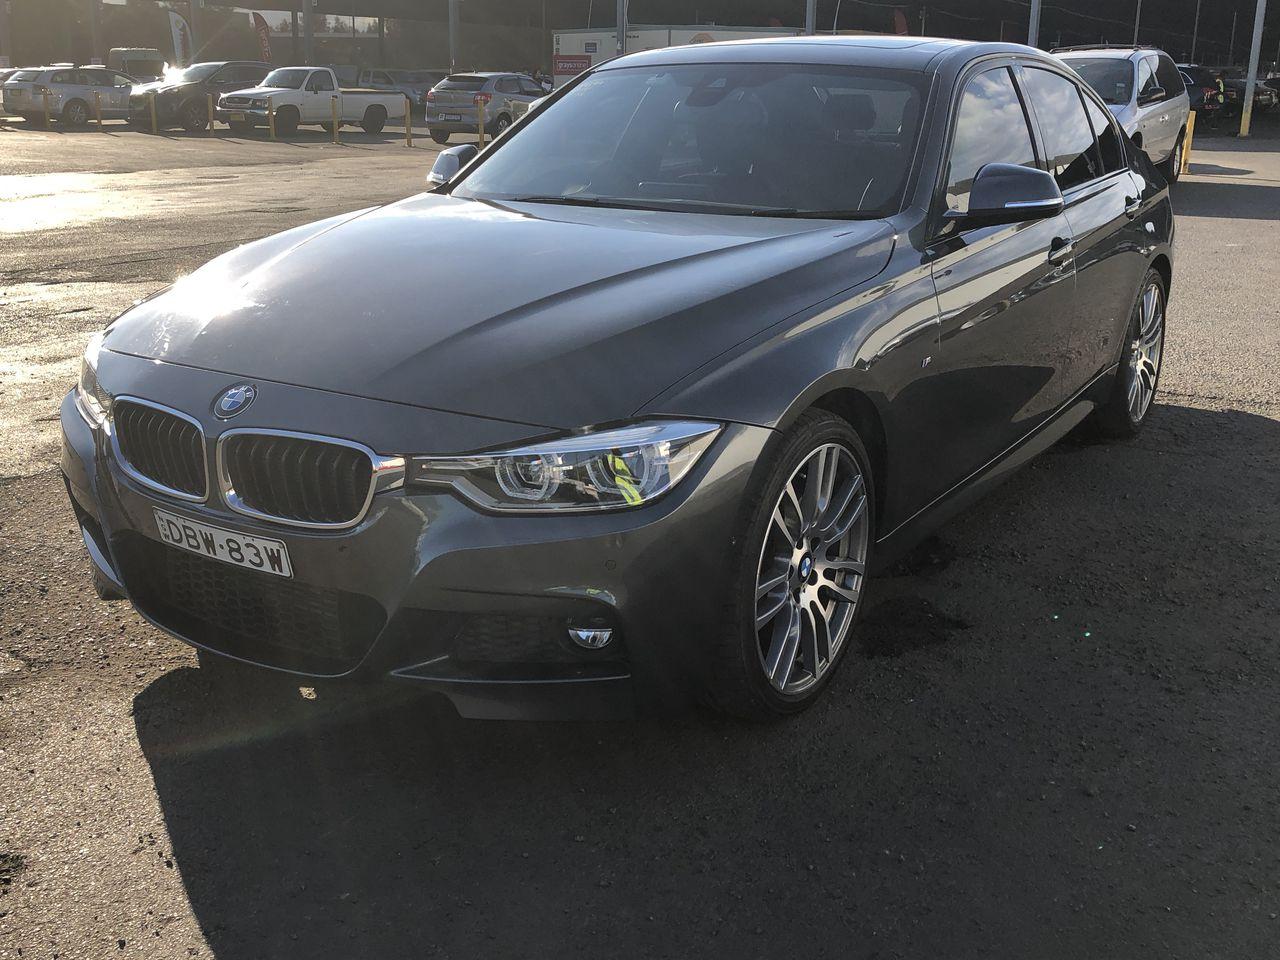 2015 BMW 3 Series 318i F30 LCI Automatic - 8 Speed Sedan